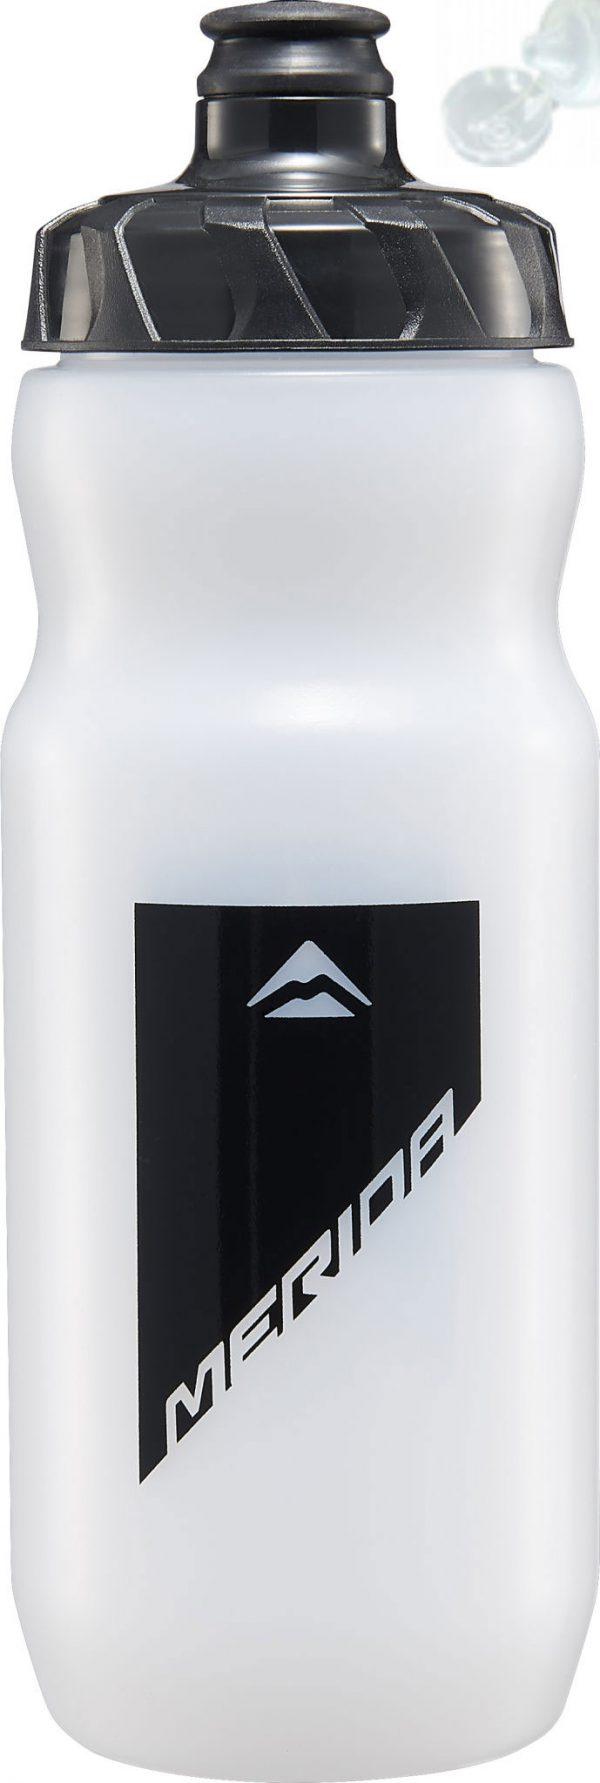 Фляга Merida Bottle/Transparent Black 715 мл с крышкой